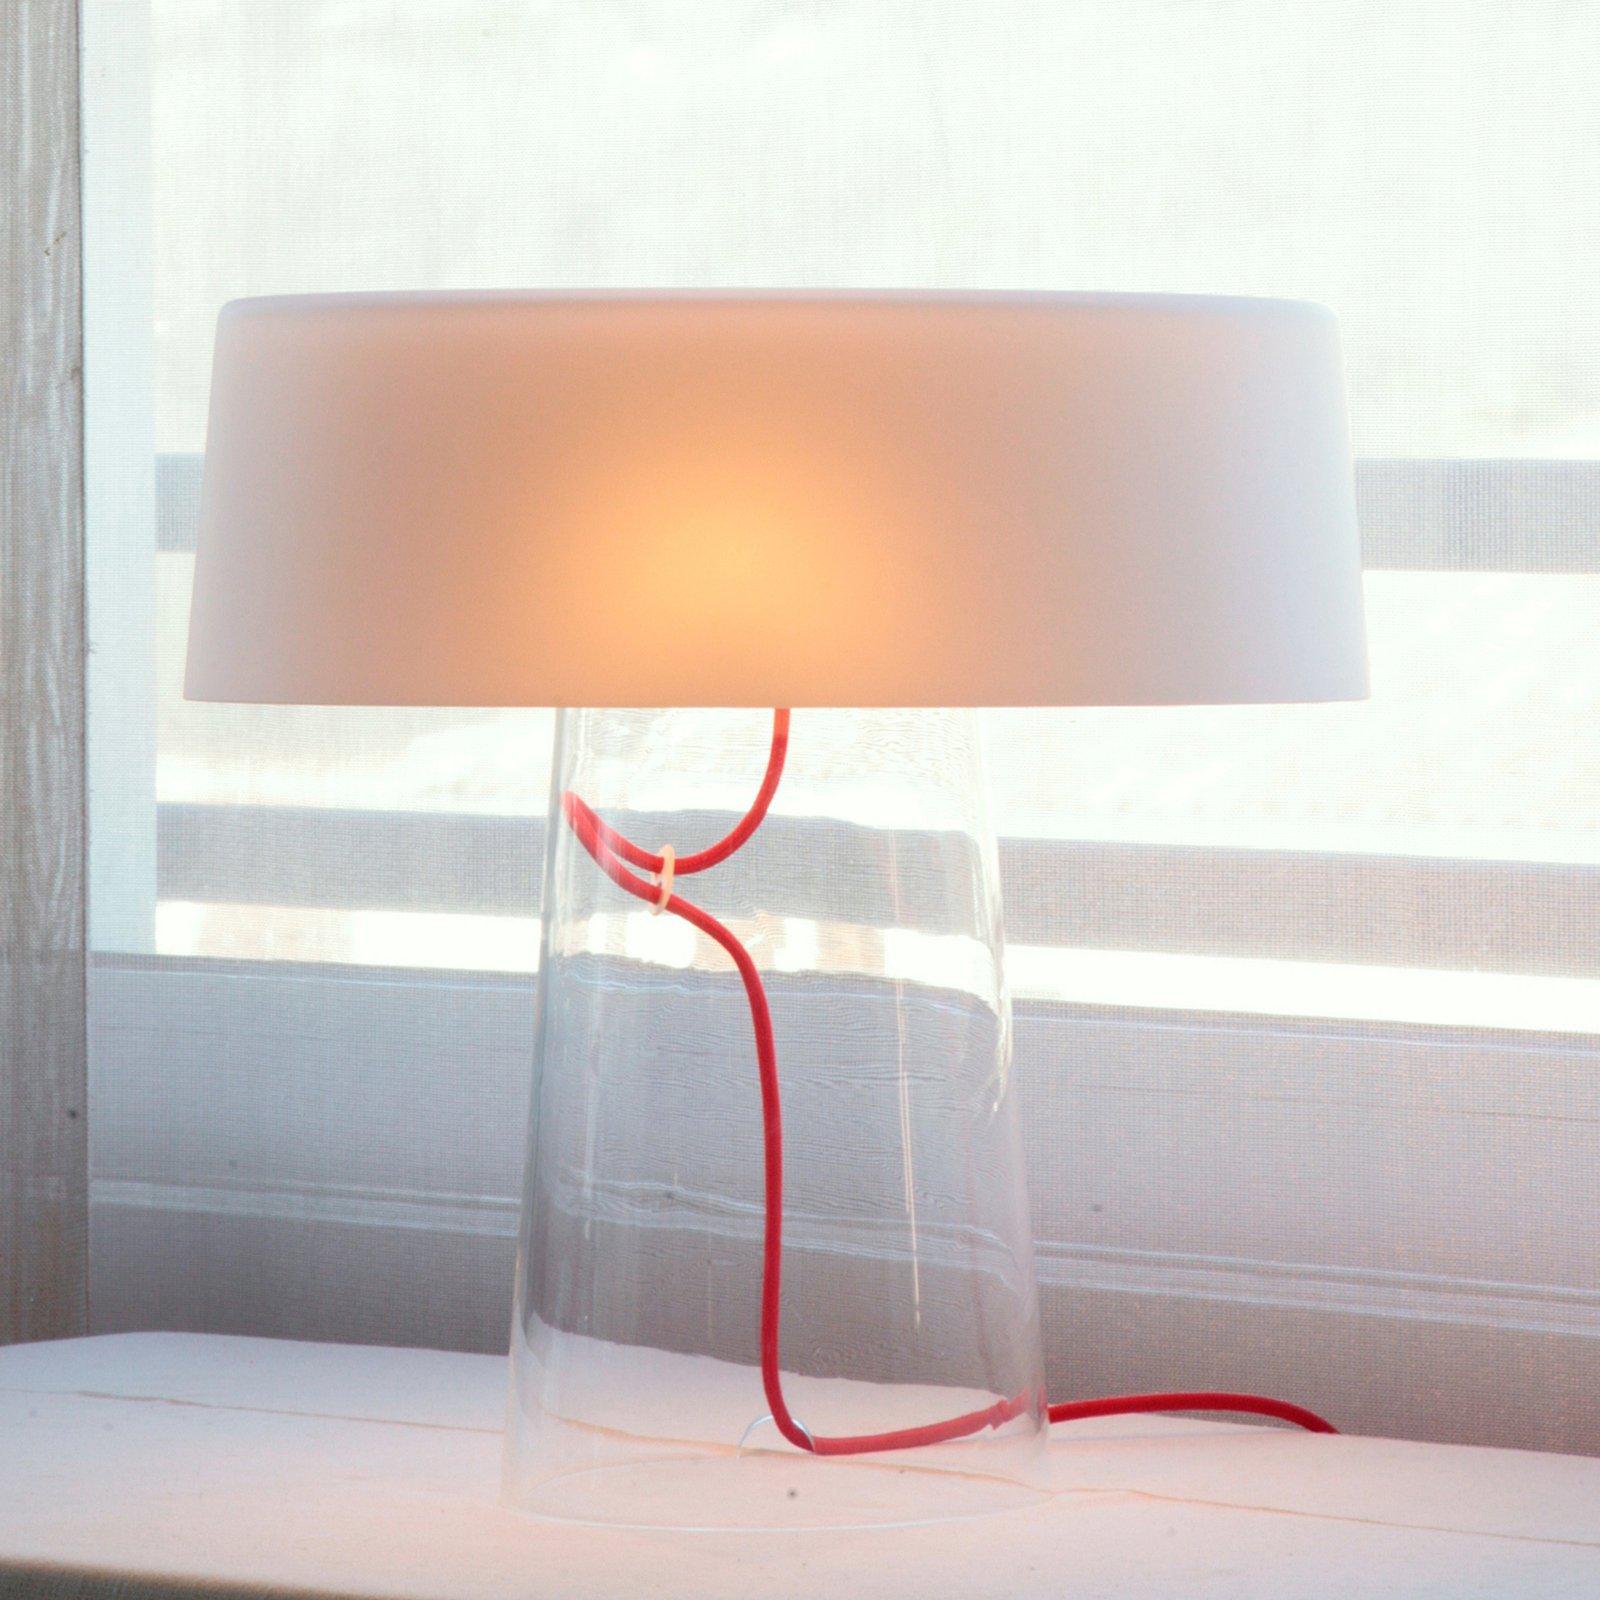 Prandina Glam bordlampe 36 cm klar / skjerm hvit